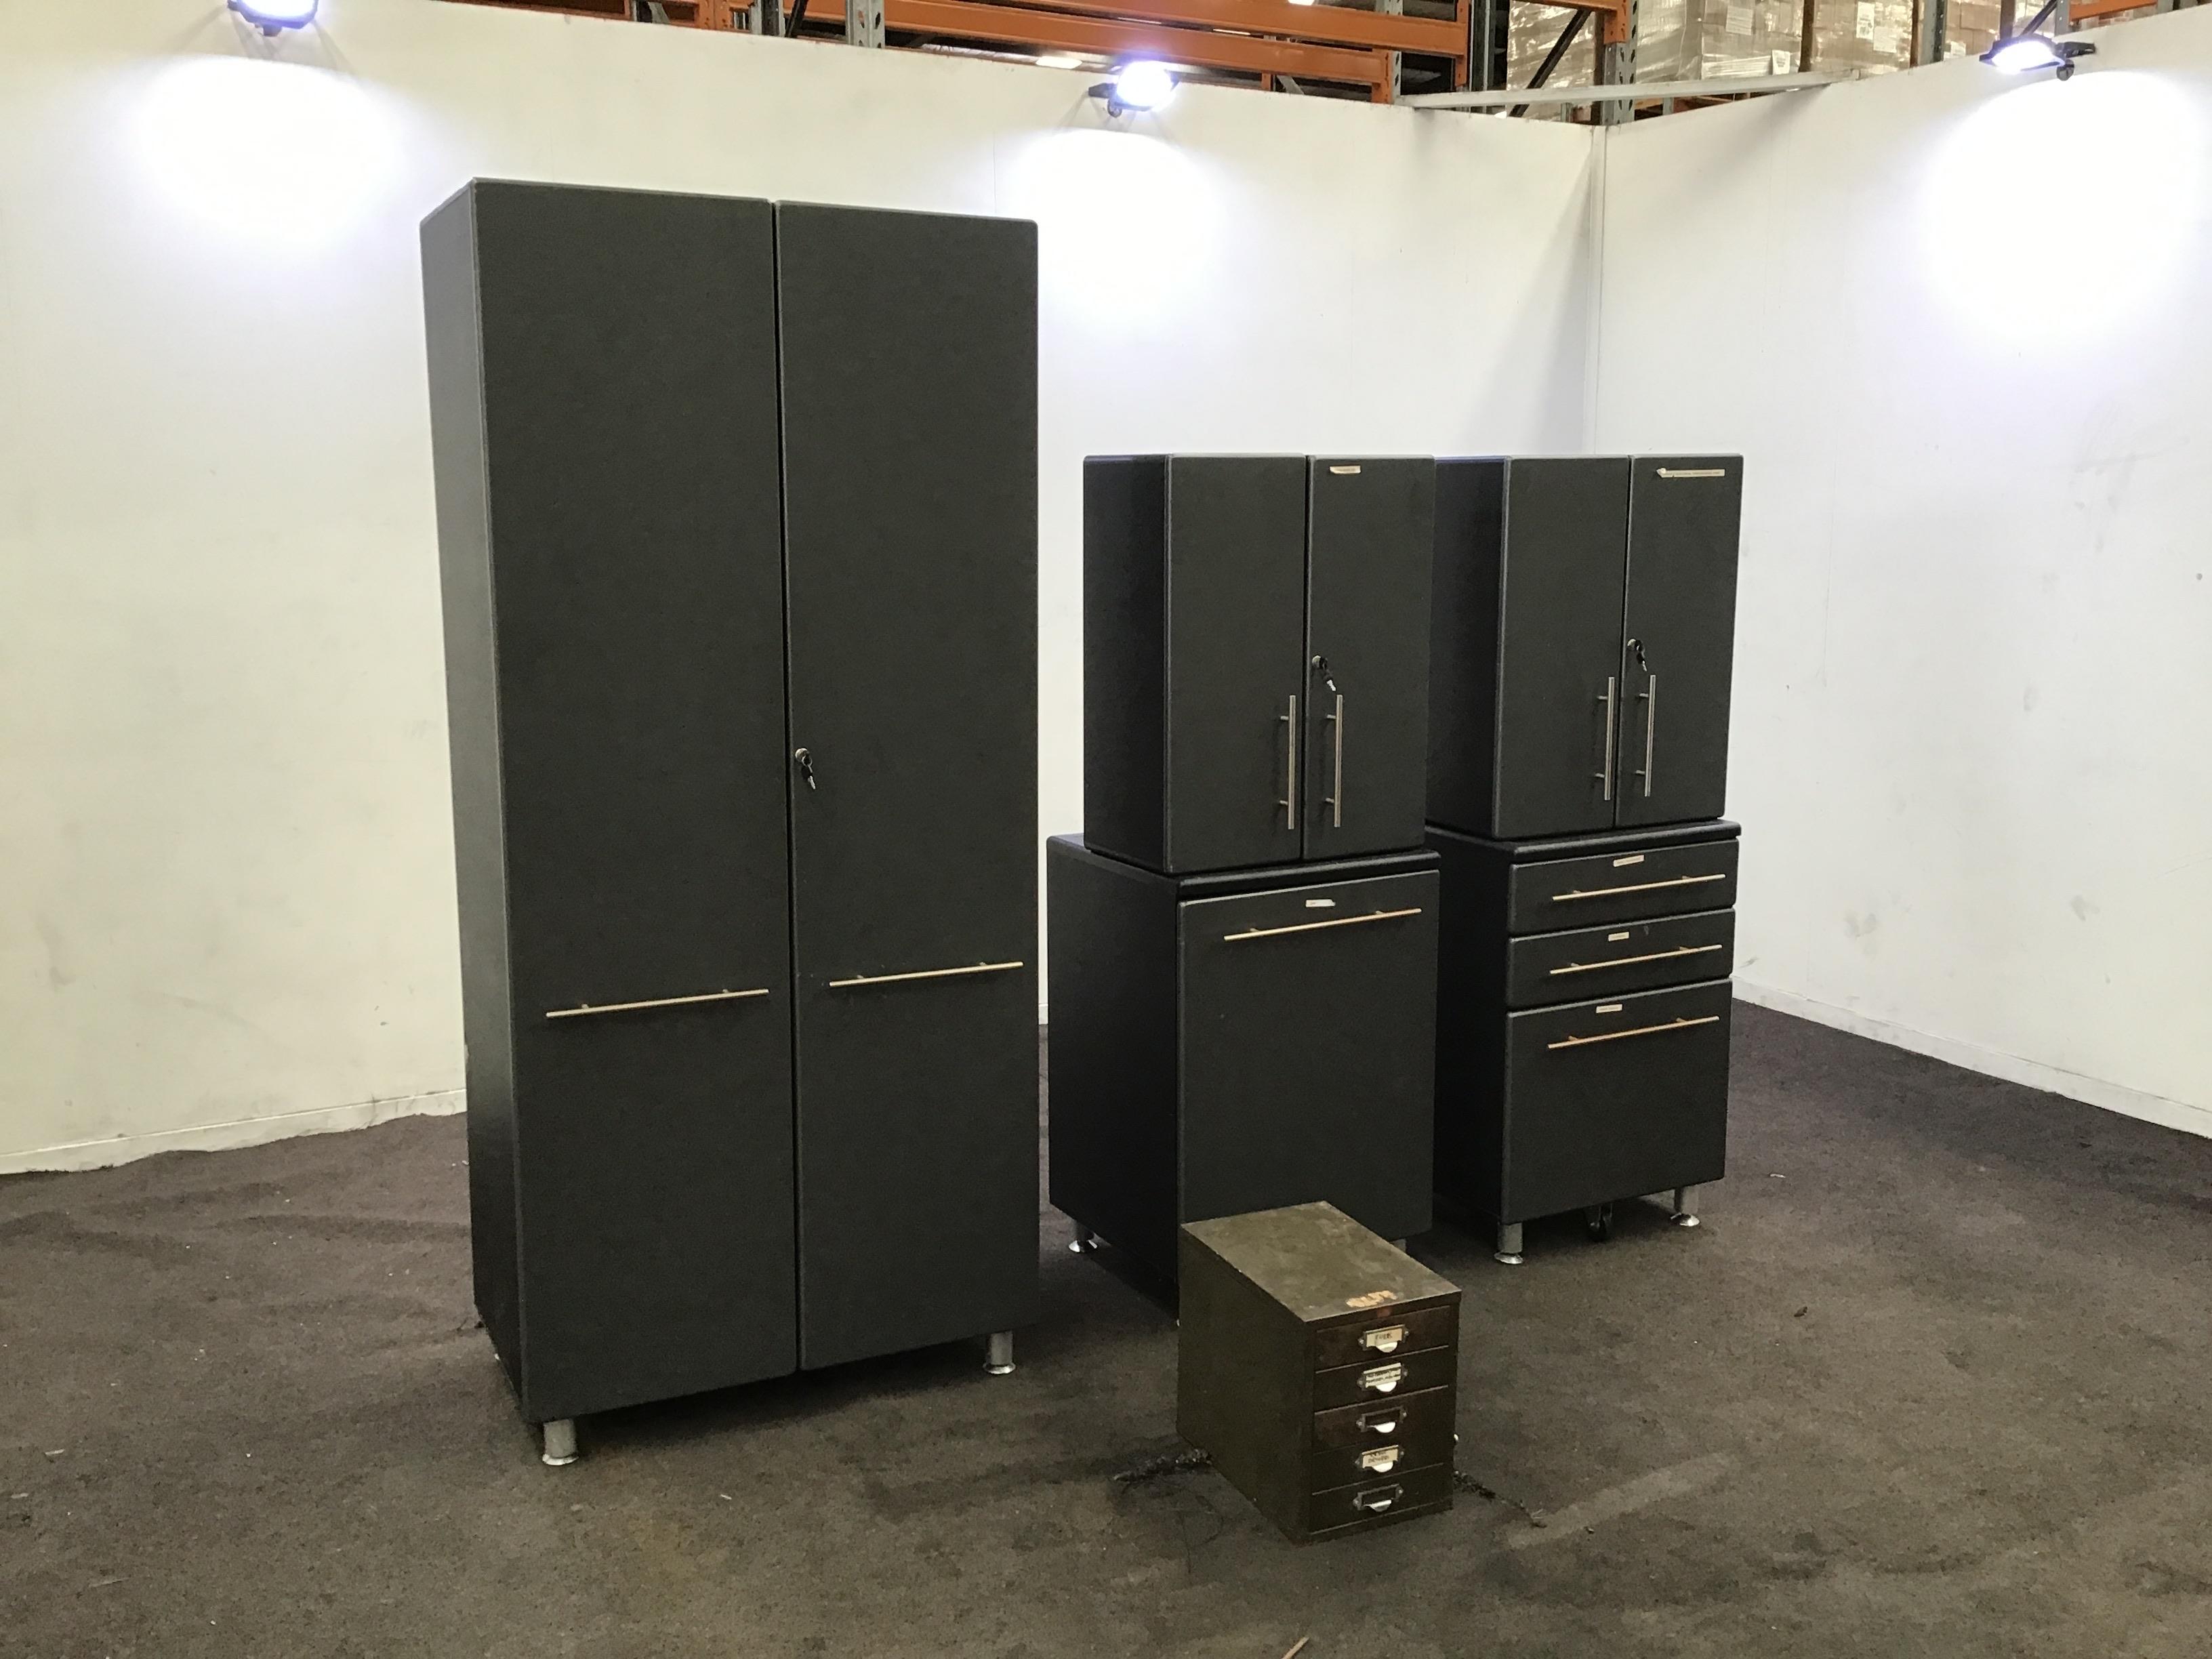 Qty 5 x Storage Cabinets